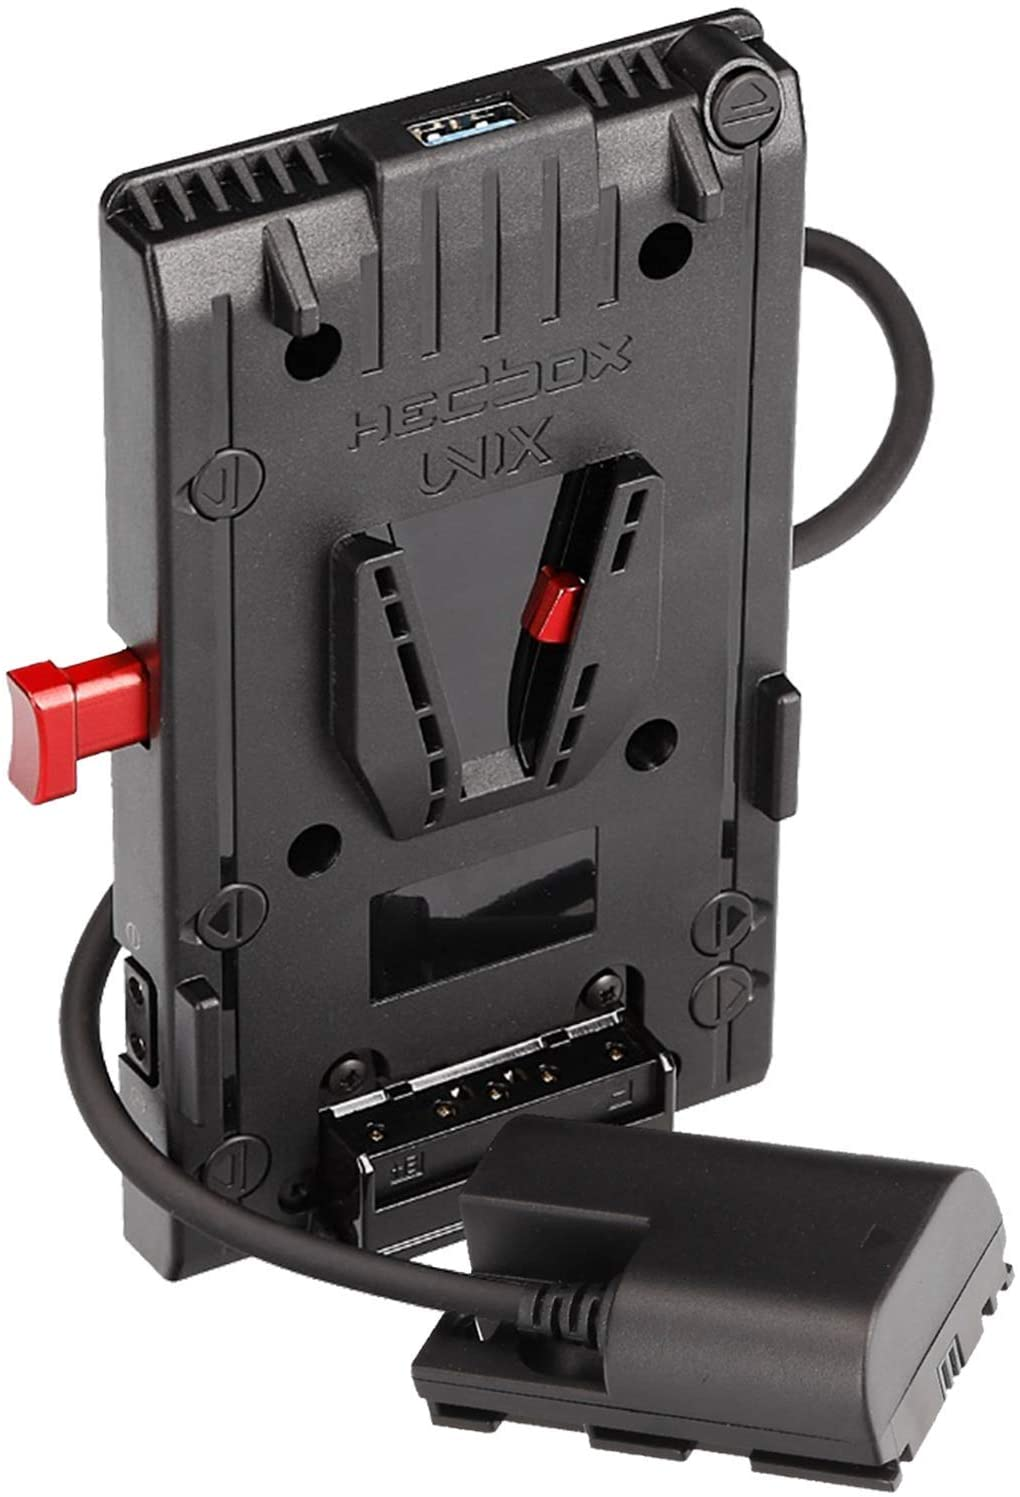 HEDBOX | Unix-LPE6 | V Mount V-Lock Battery Adapter Plate, with 1x USB 5V/2.1A and 3X D-Tap 14.8V/148W Power Out, for Canon EOS 5D/6D/7D/60D/70D/80D DSLR Cameras, via LP-E6 housing